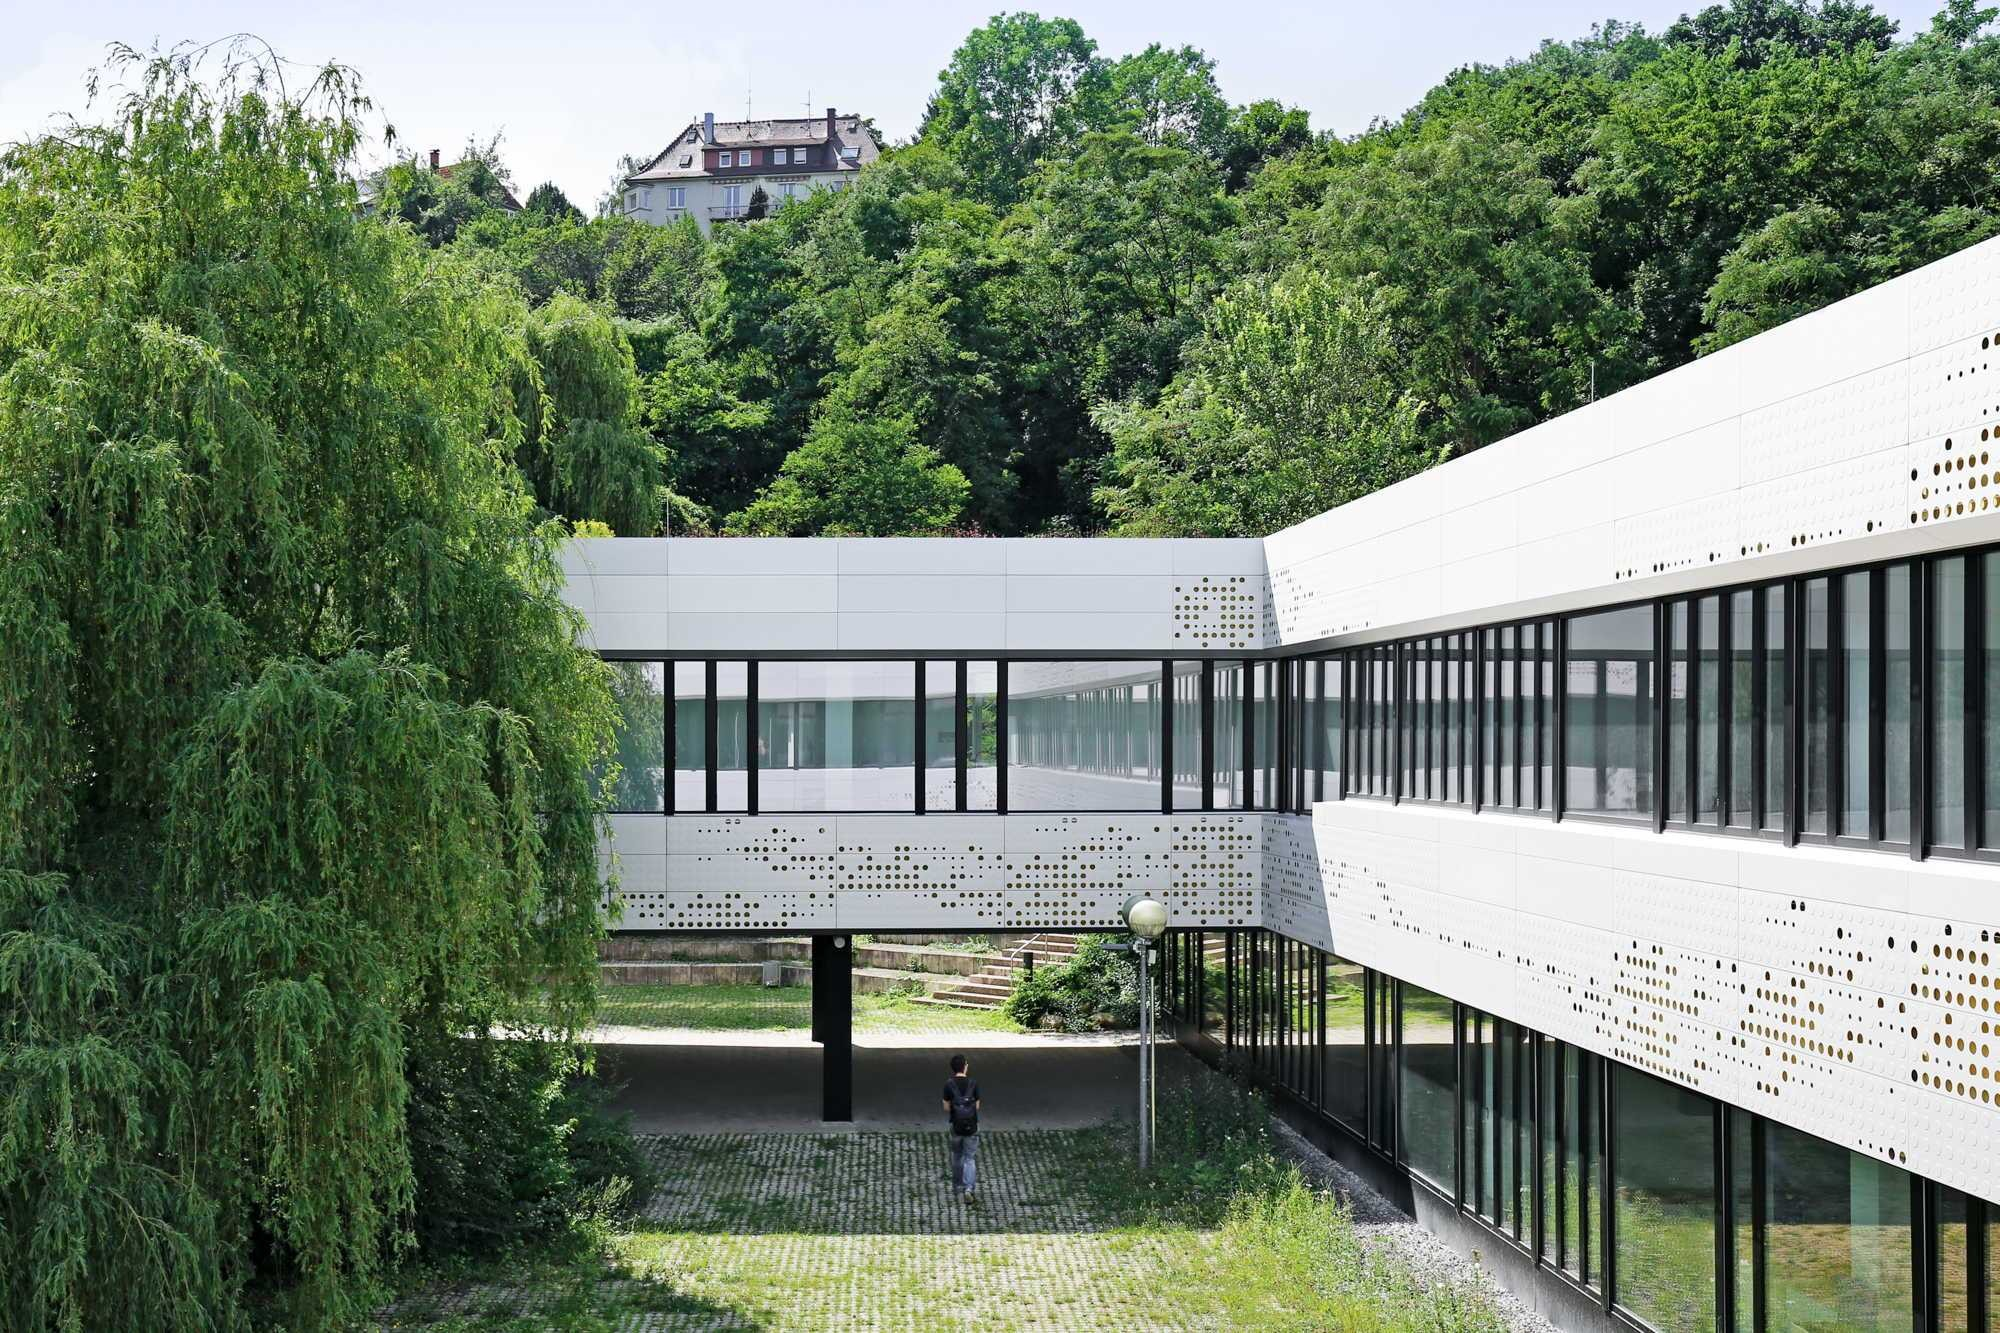 schulzentrum nord in stuttgart brandschutz kultur. Black Bedroom Furniture Sets. Home Design Ideas